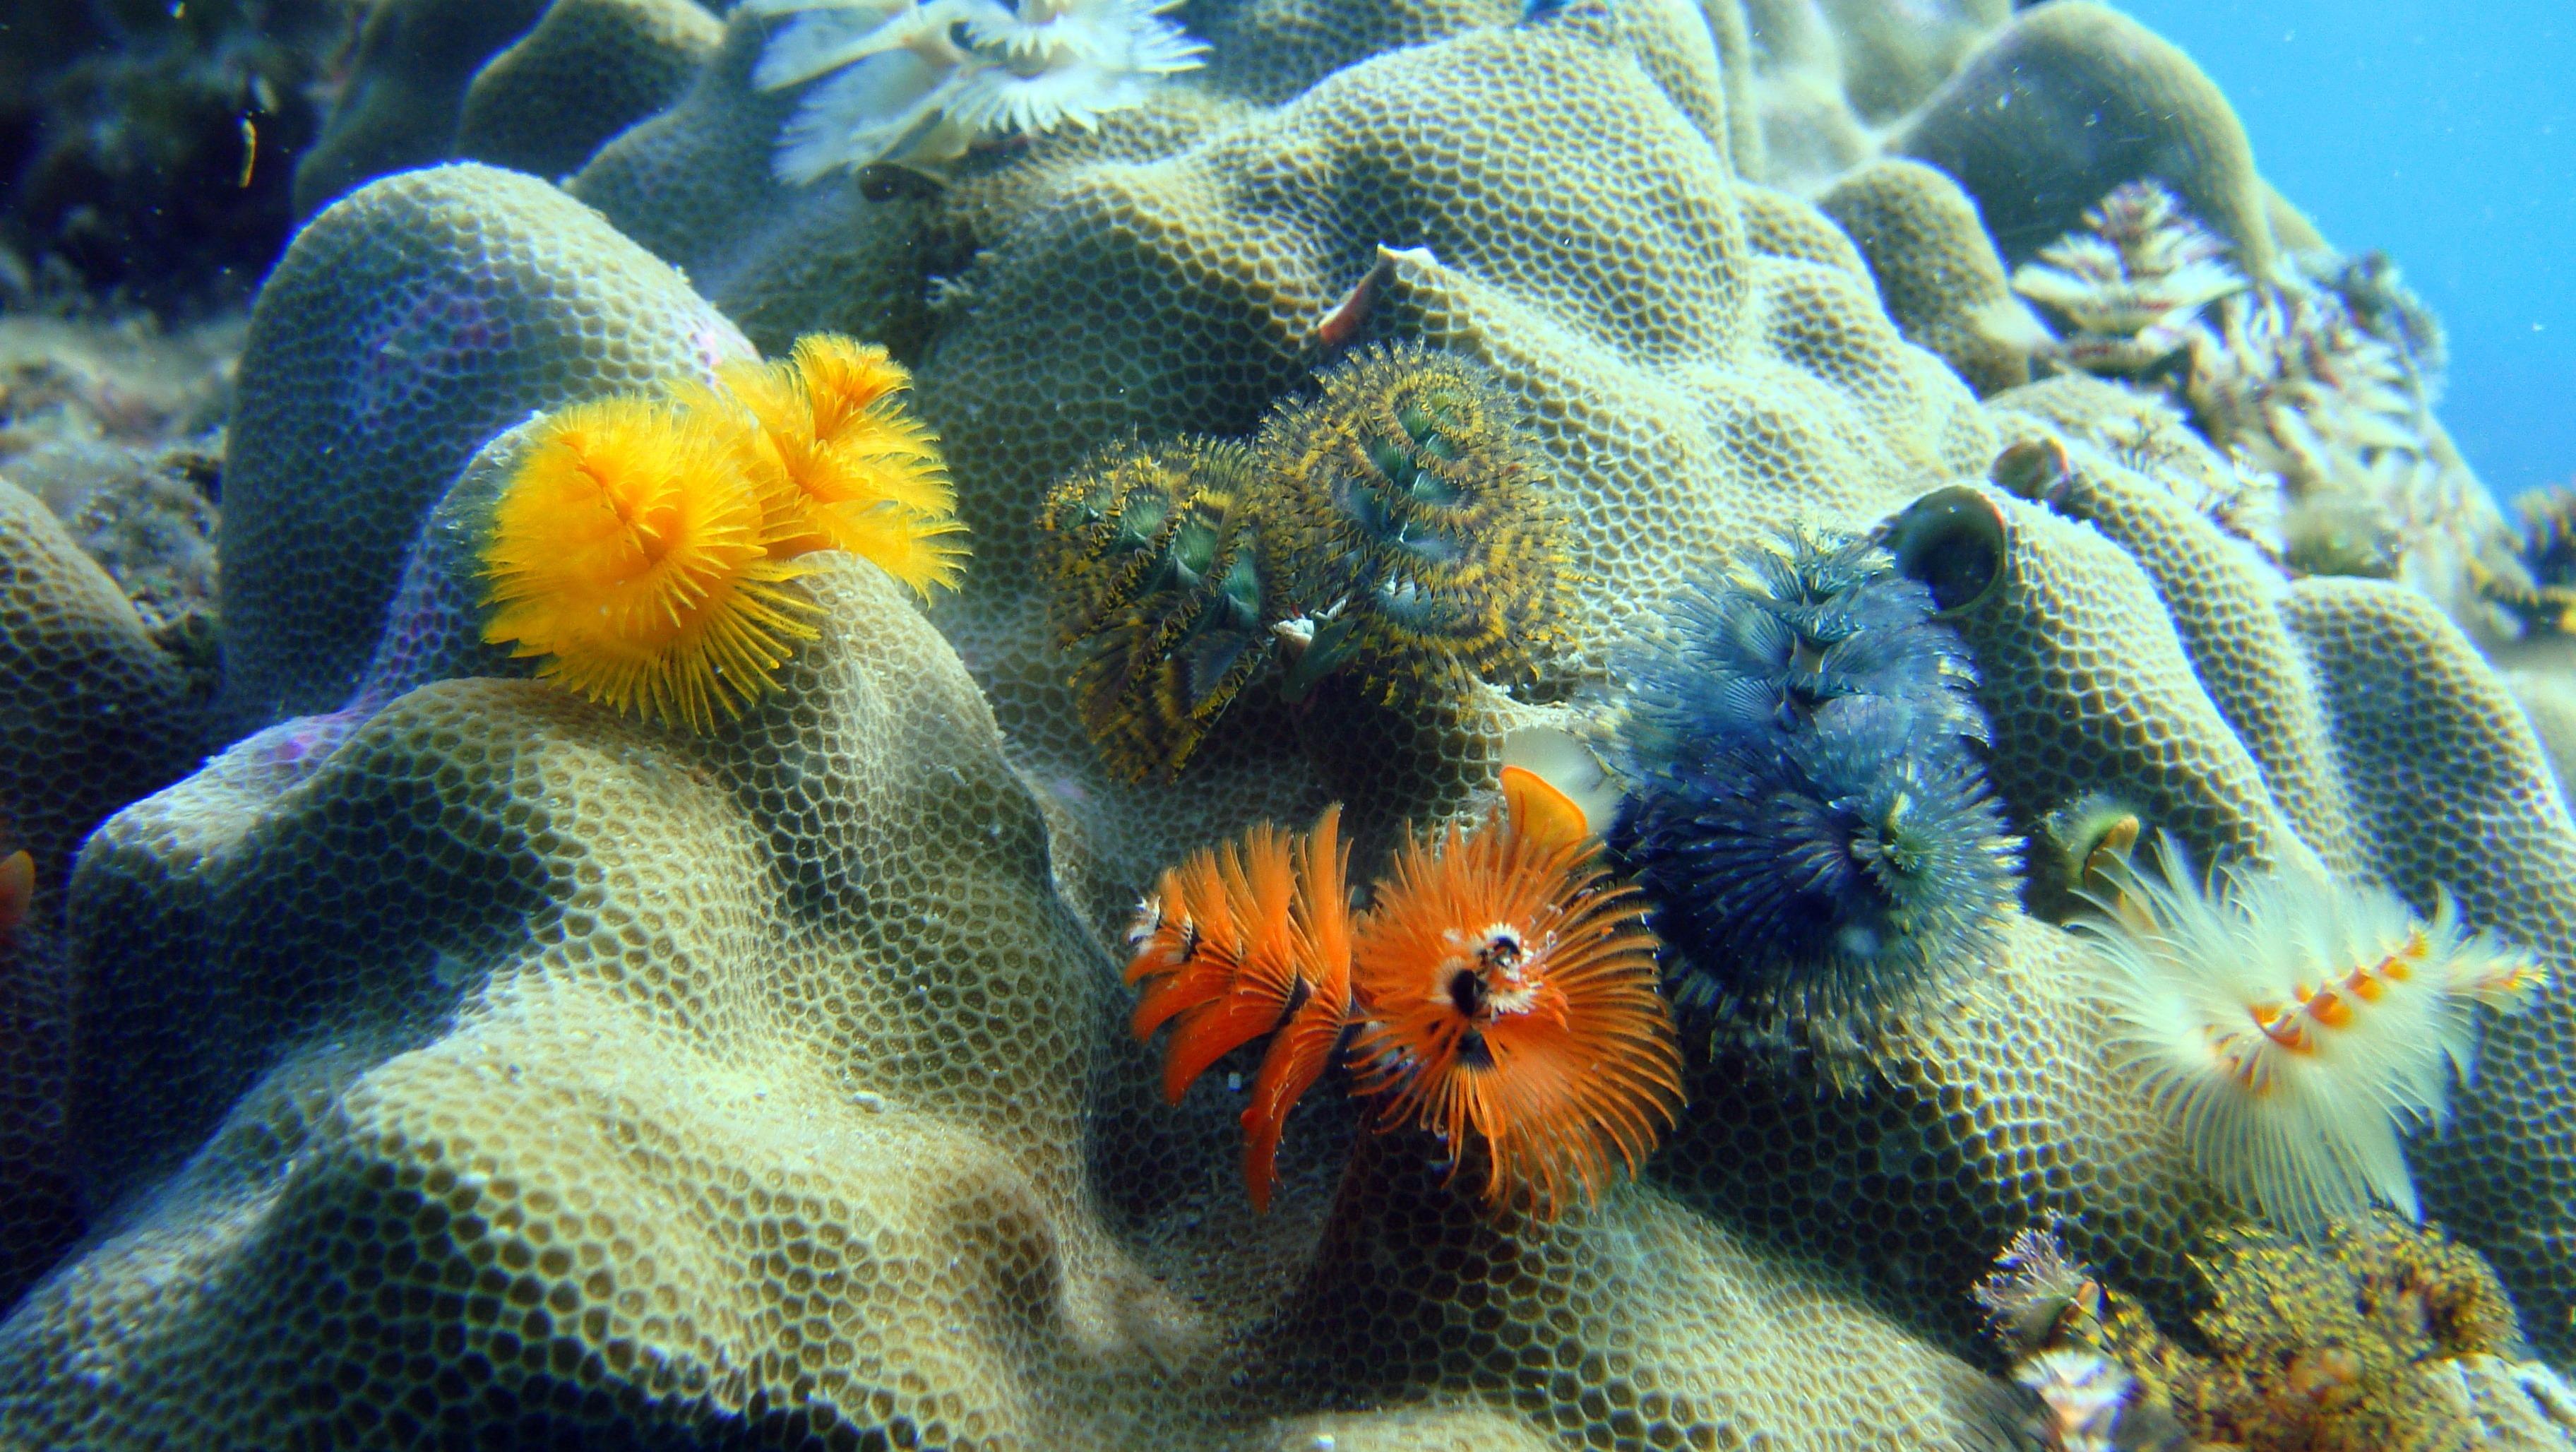 free images animal wildlife underwater tropical aquatic